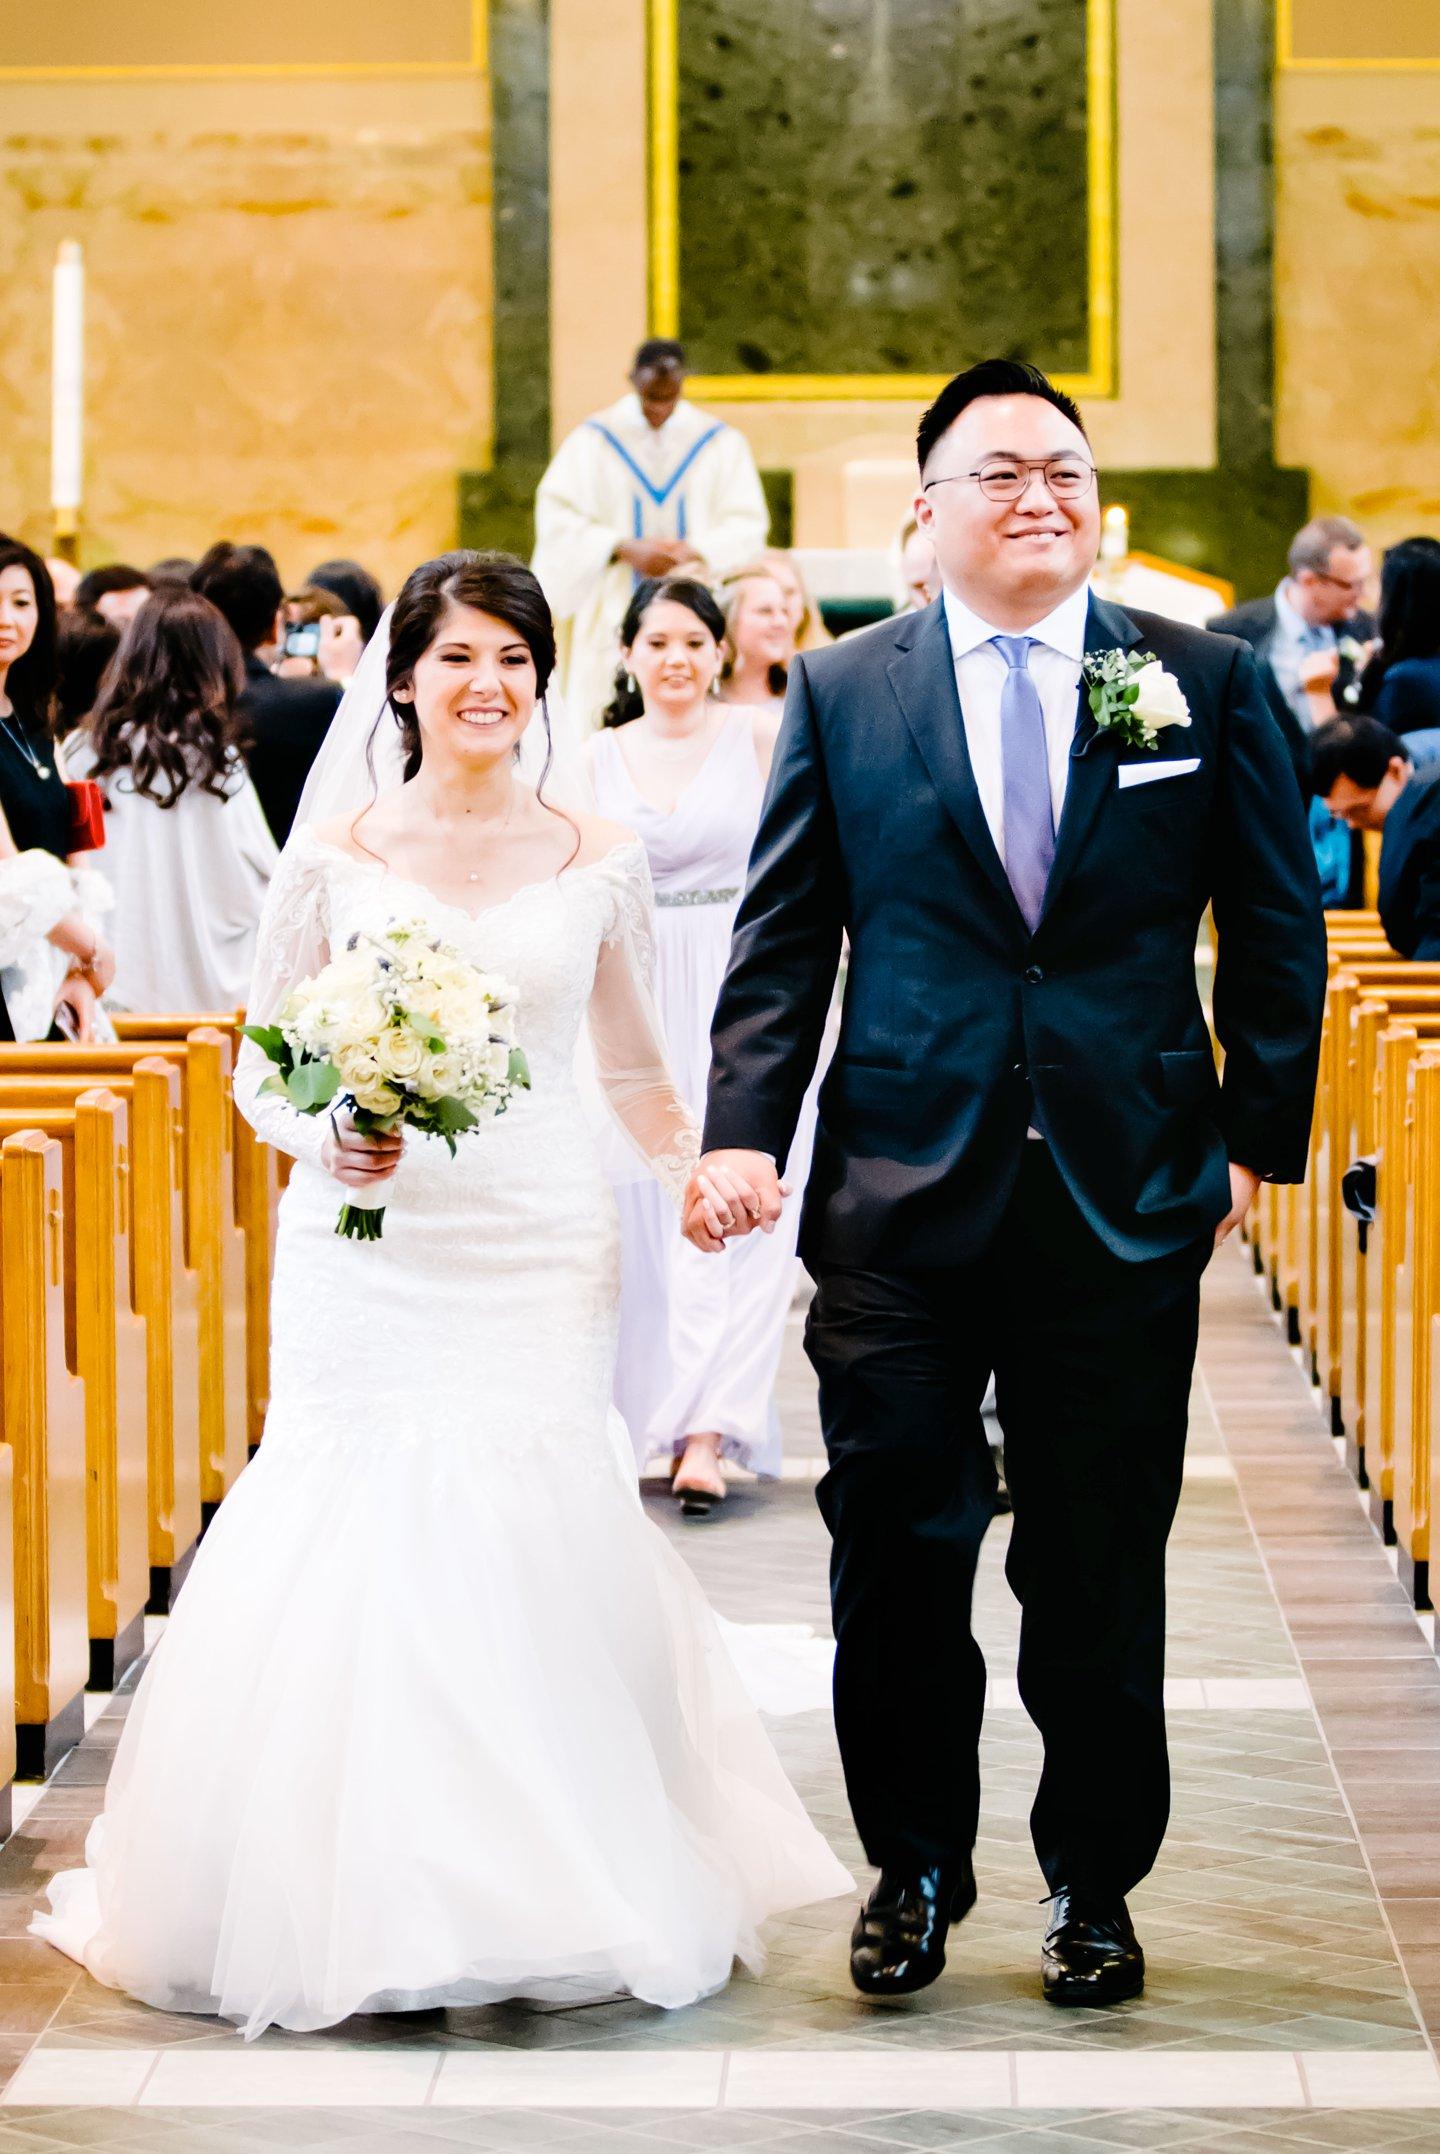 lake-geneva-fine-art-wedding-photographer-santos26